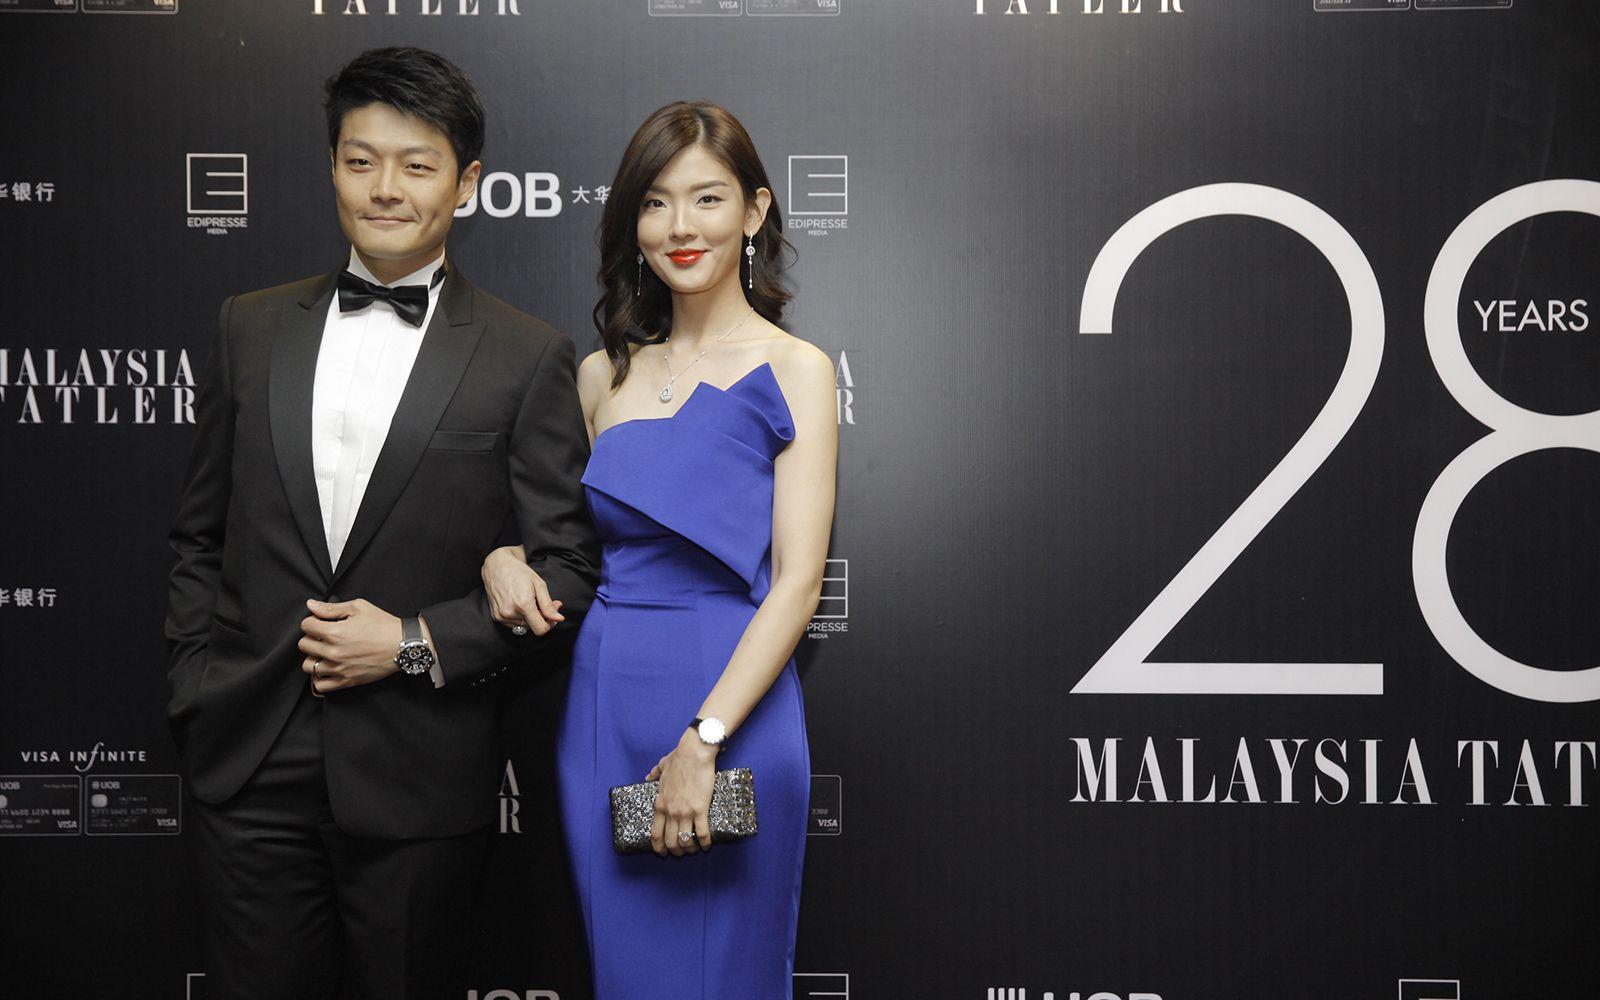 Gavin Li and Yen Goh in Jadore Evening dress